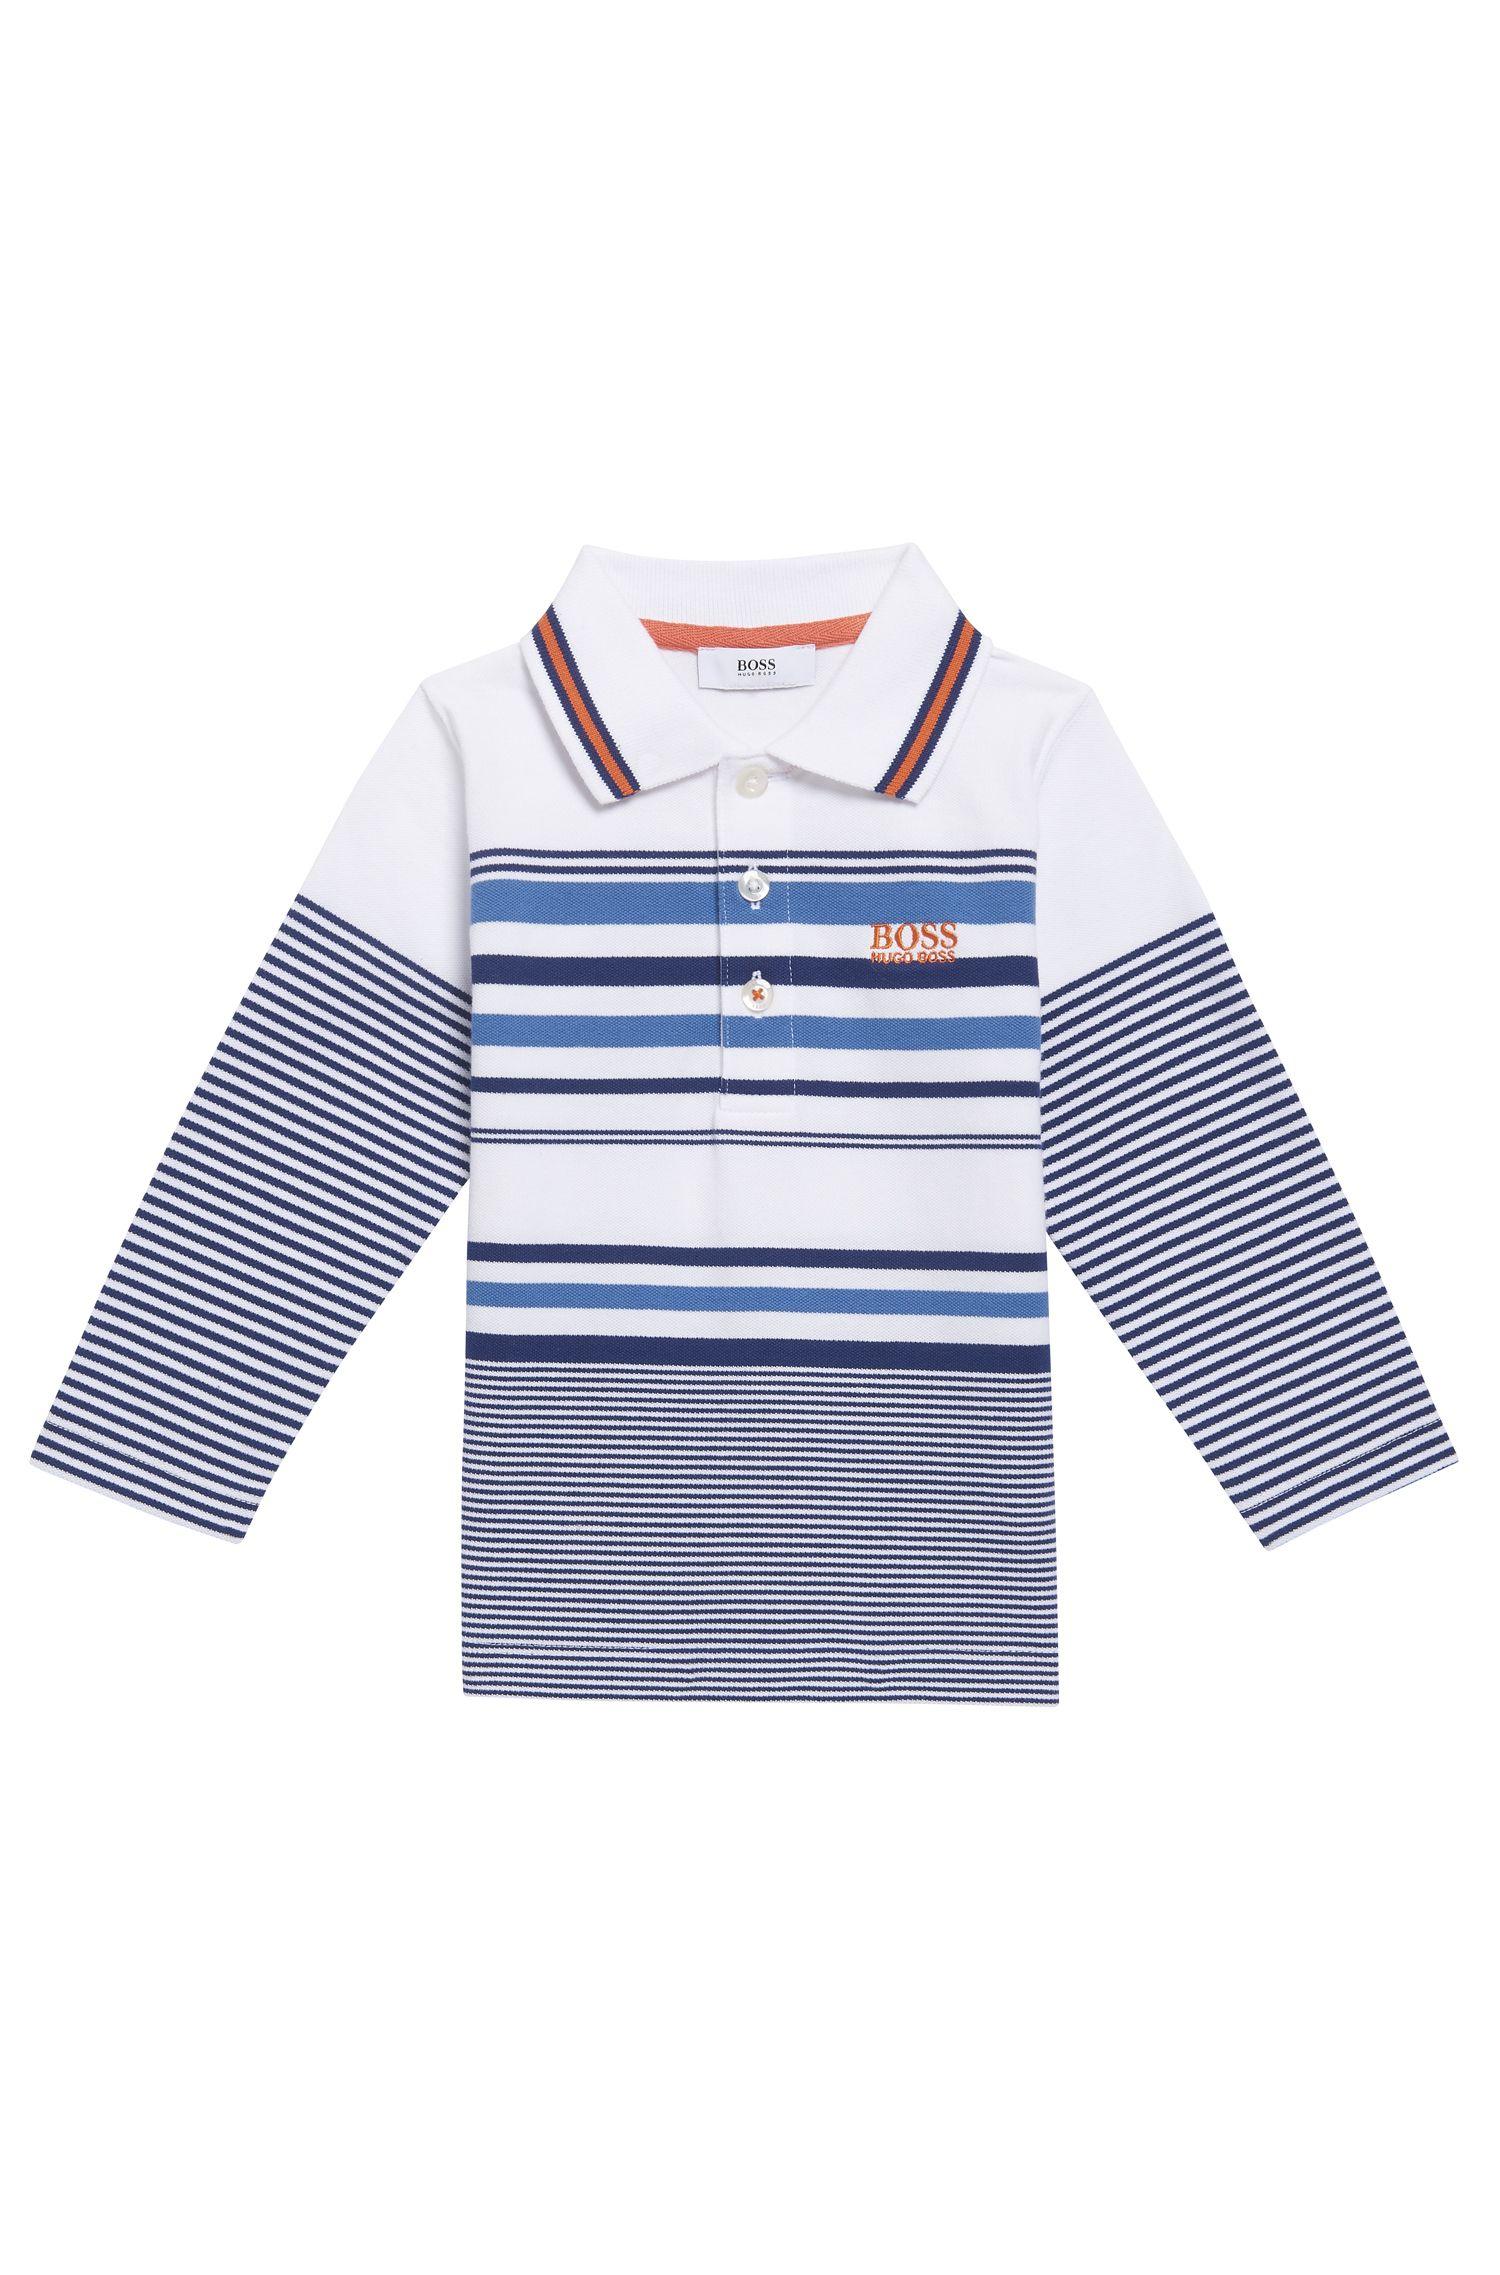 'J05498' | Toddler Stretch Cotton Blend Polo Shirt